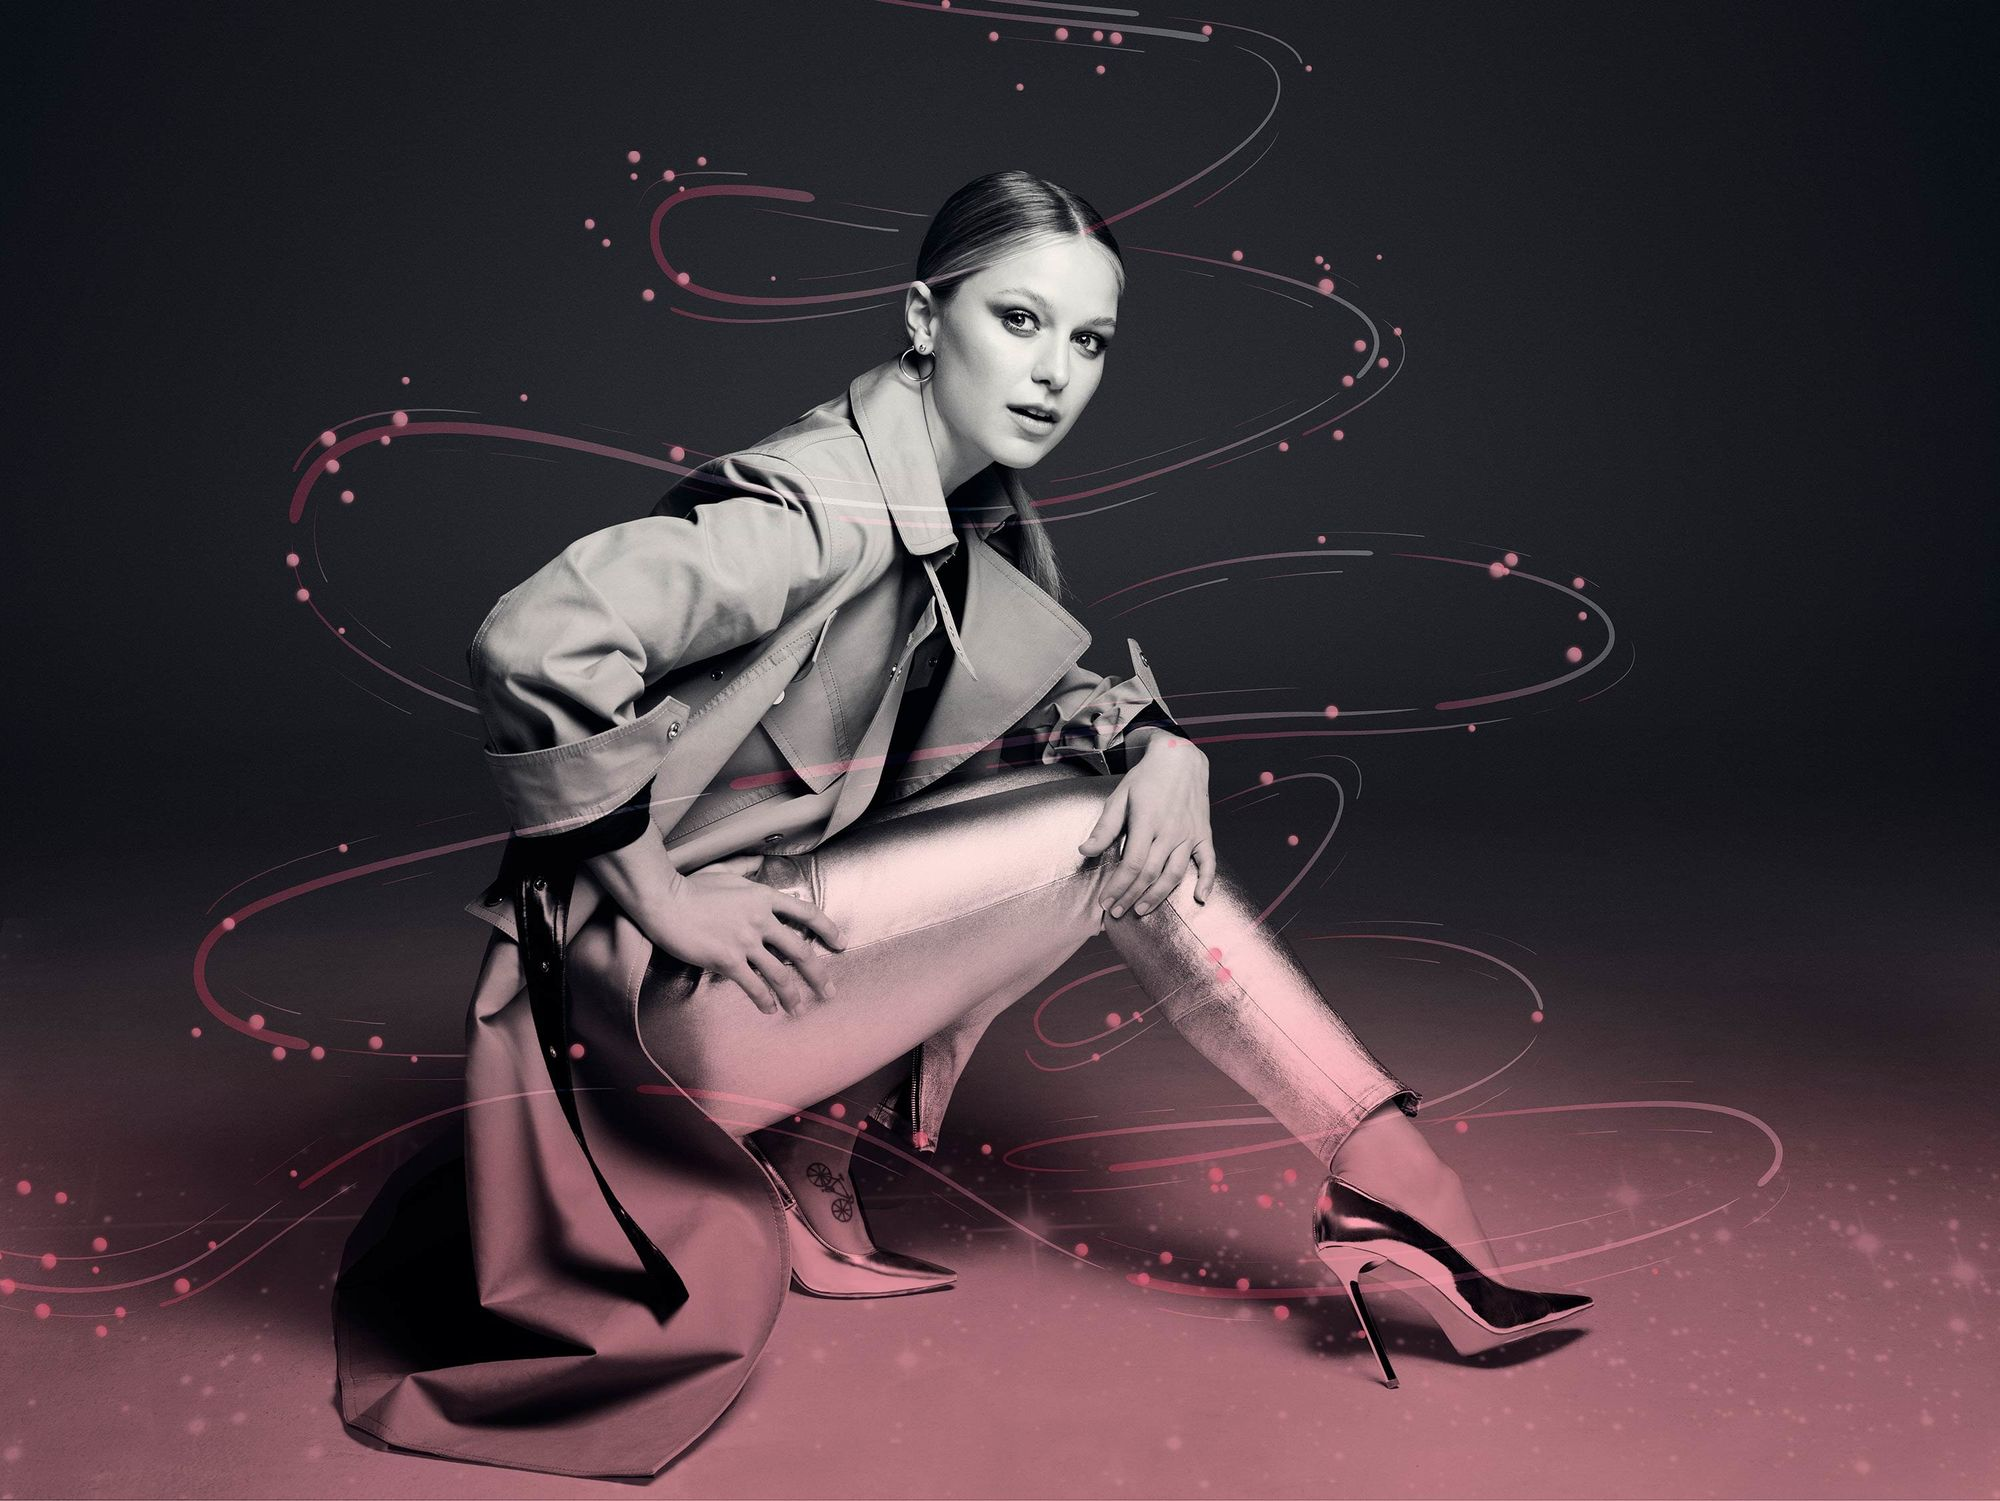 Melissa Benoist posing in a fashion shoot.